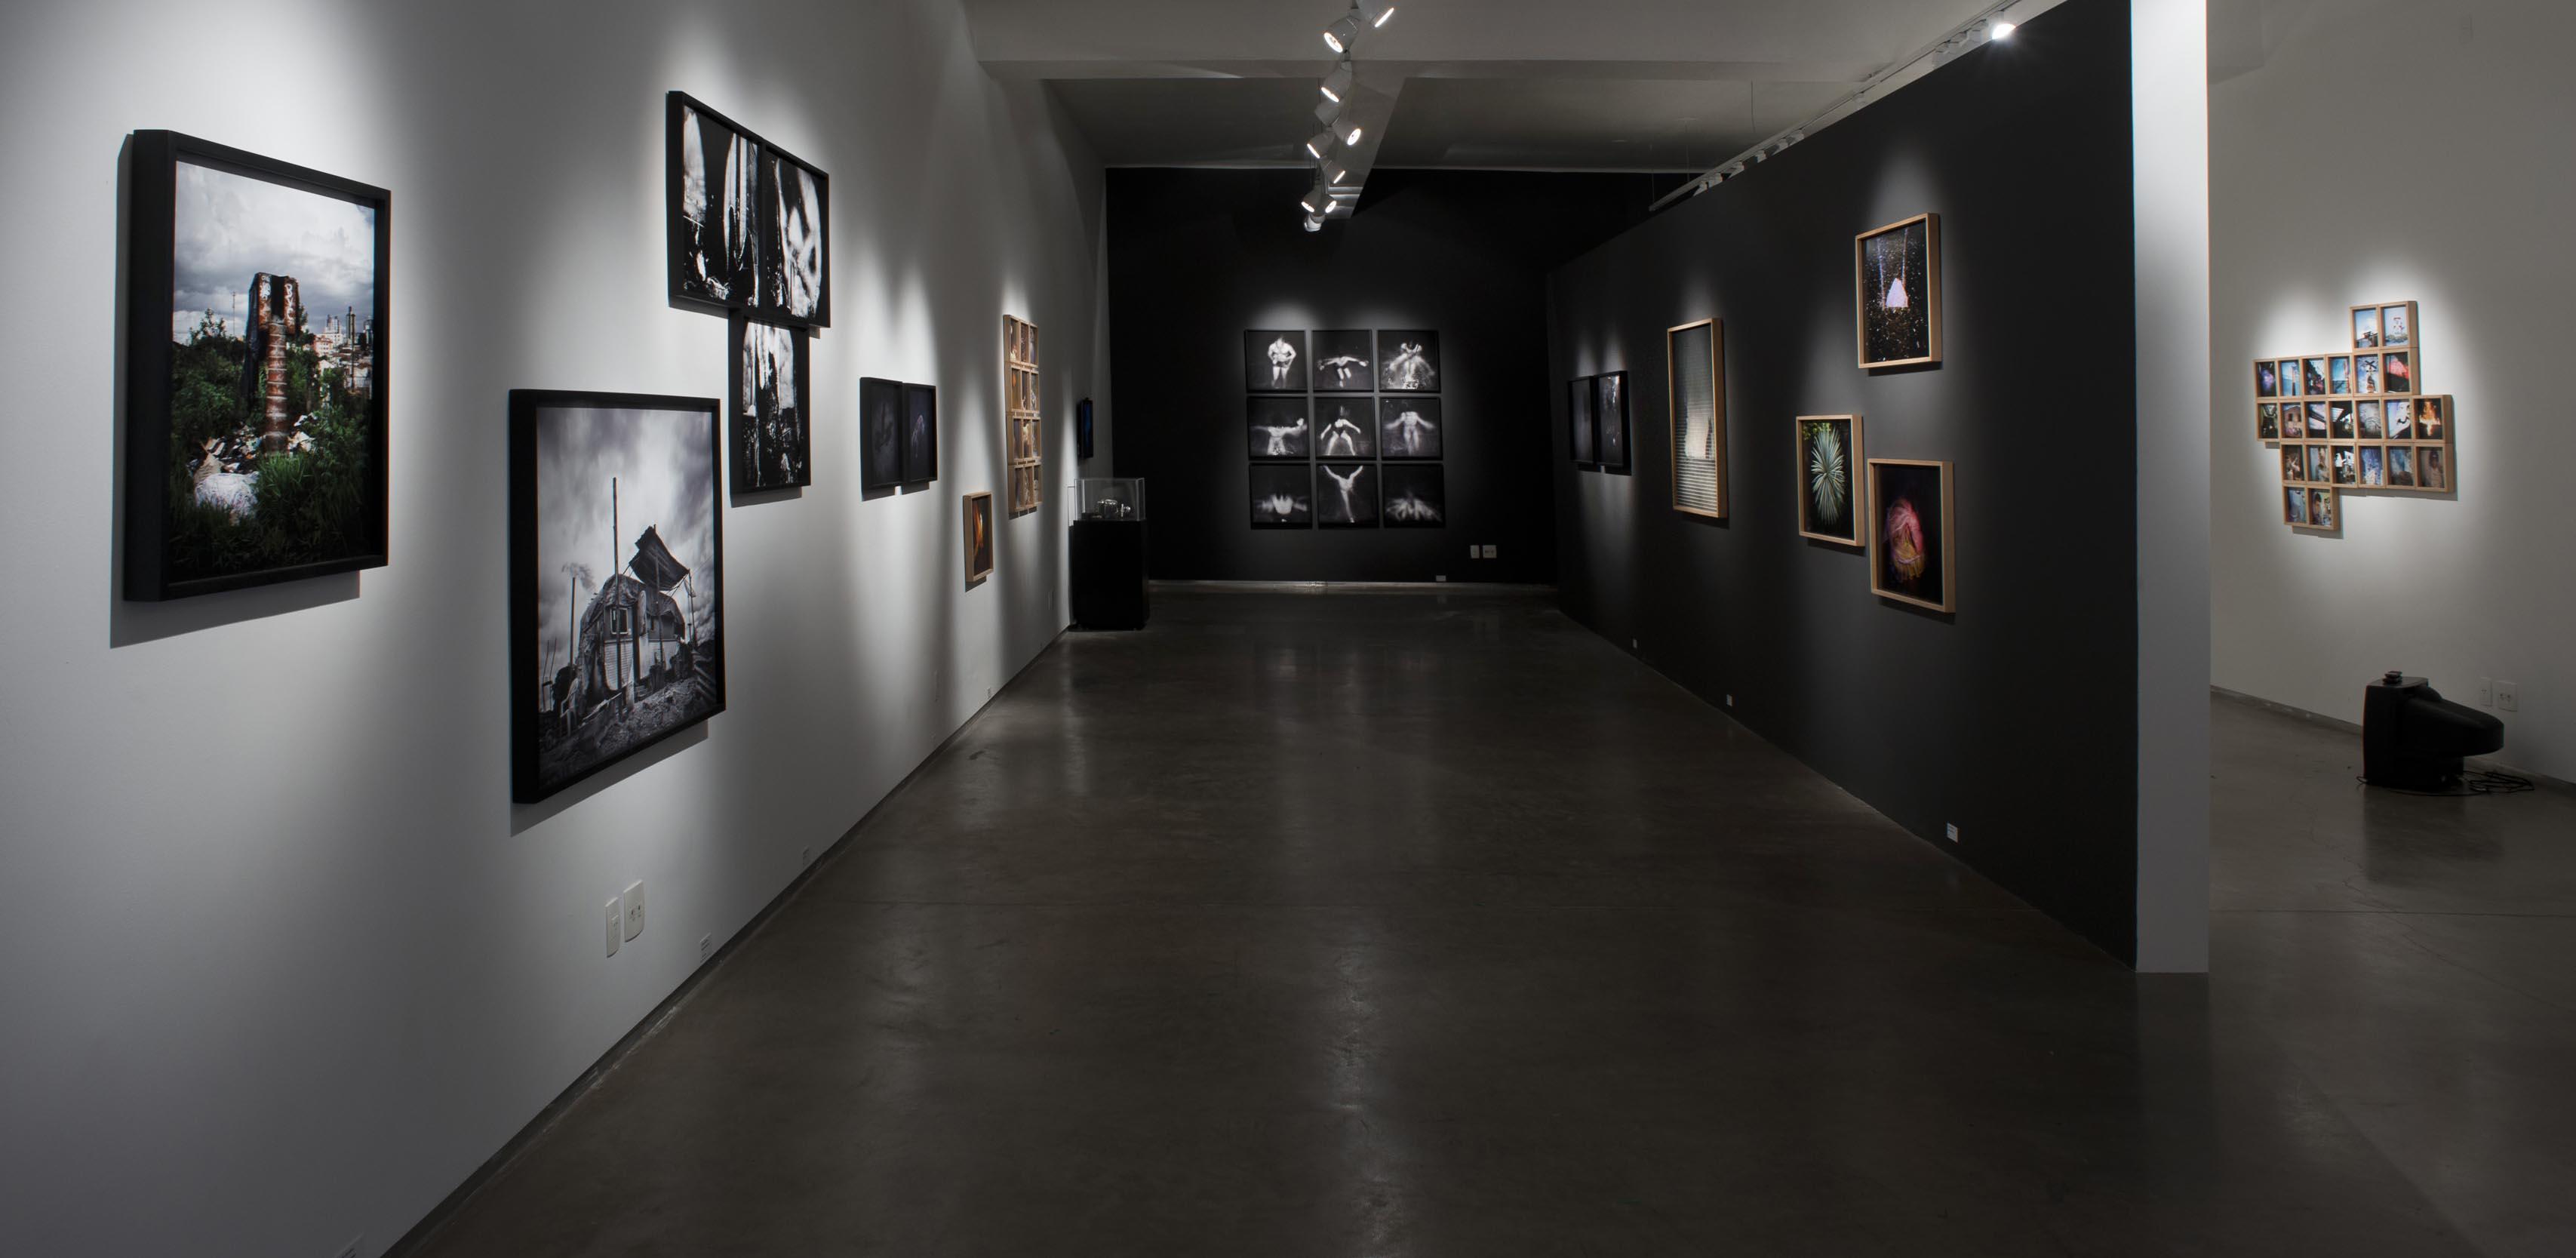 http://www.fotoempauta.com.br/festival2016/wp-content/uploads/2014/12/expo_Museu_04xy.jpg